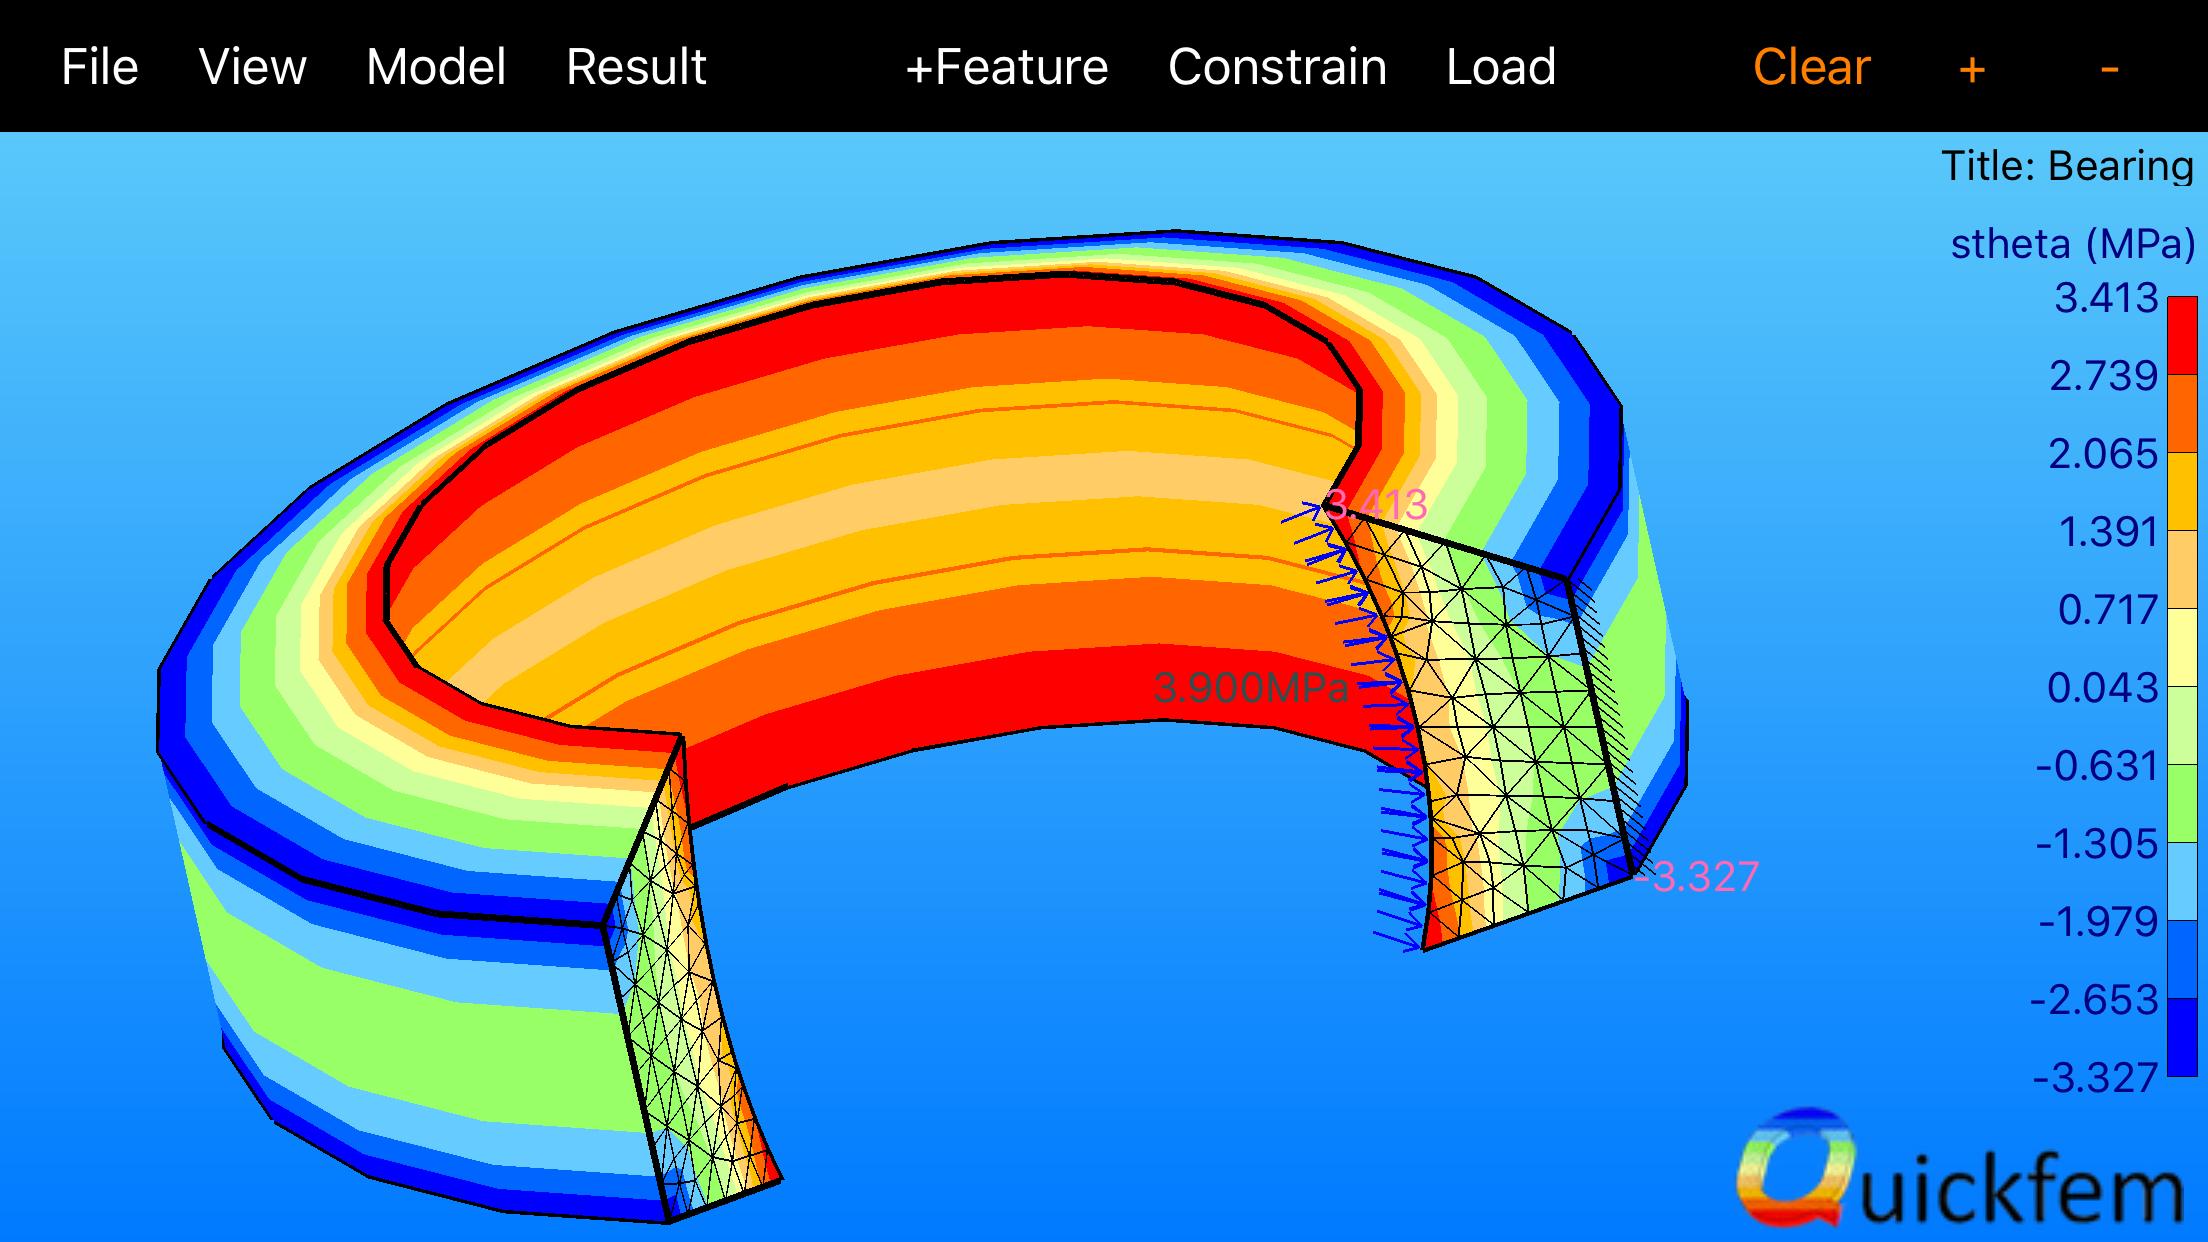 Quickfem Axisymmetric Bearing Ring